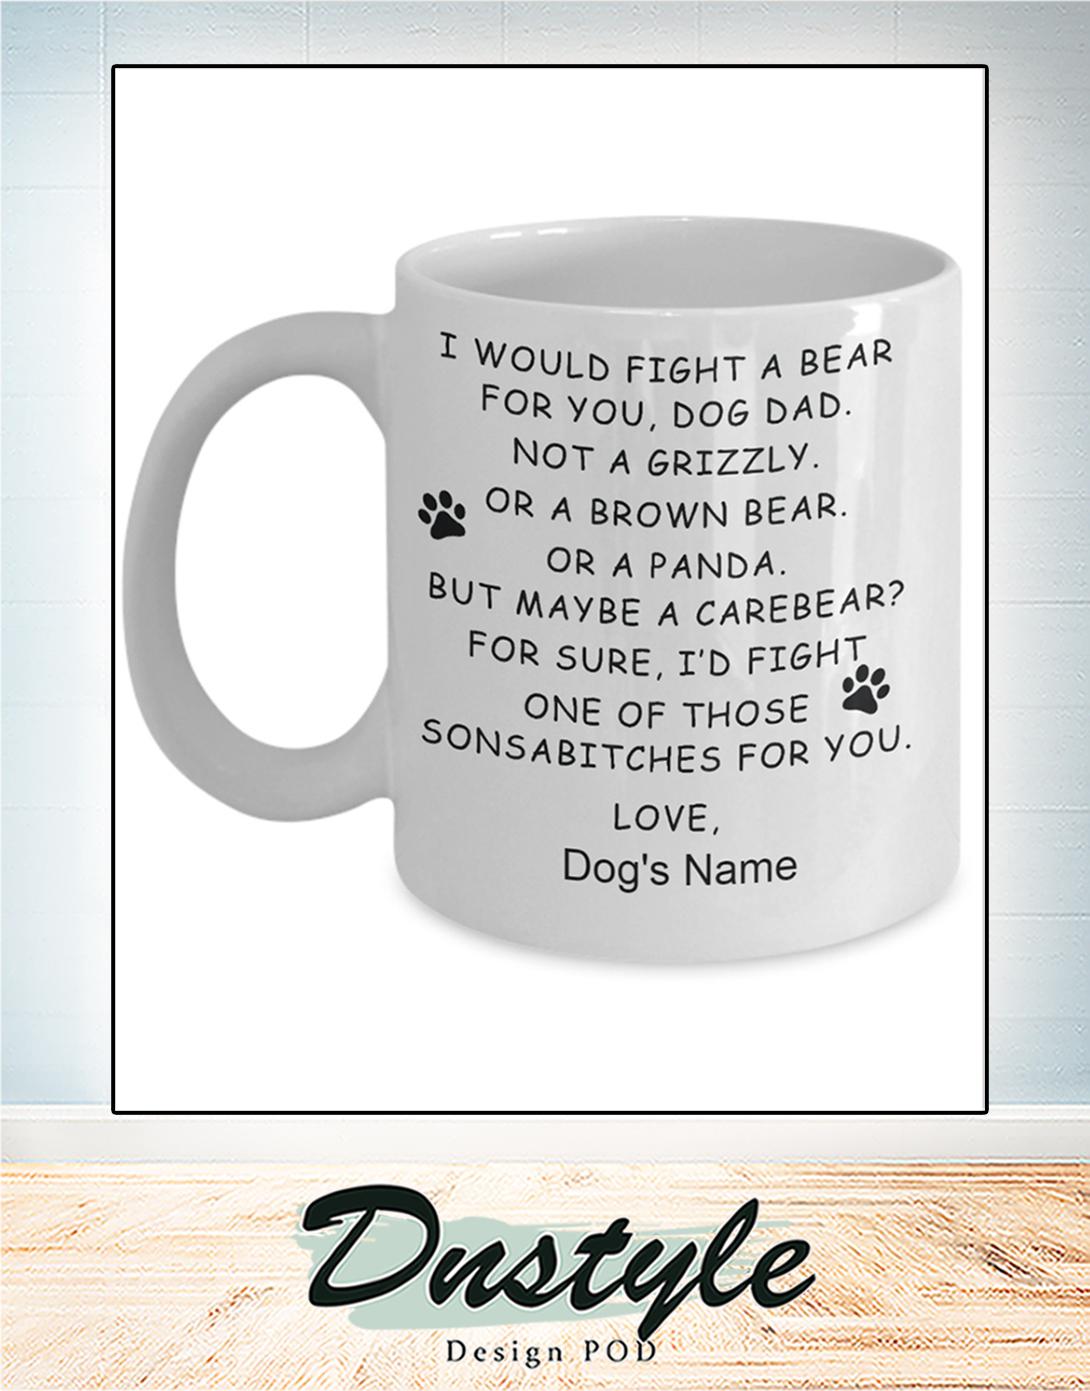 I would fight a bear for you dog dad mug 2